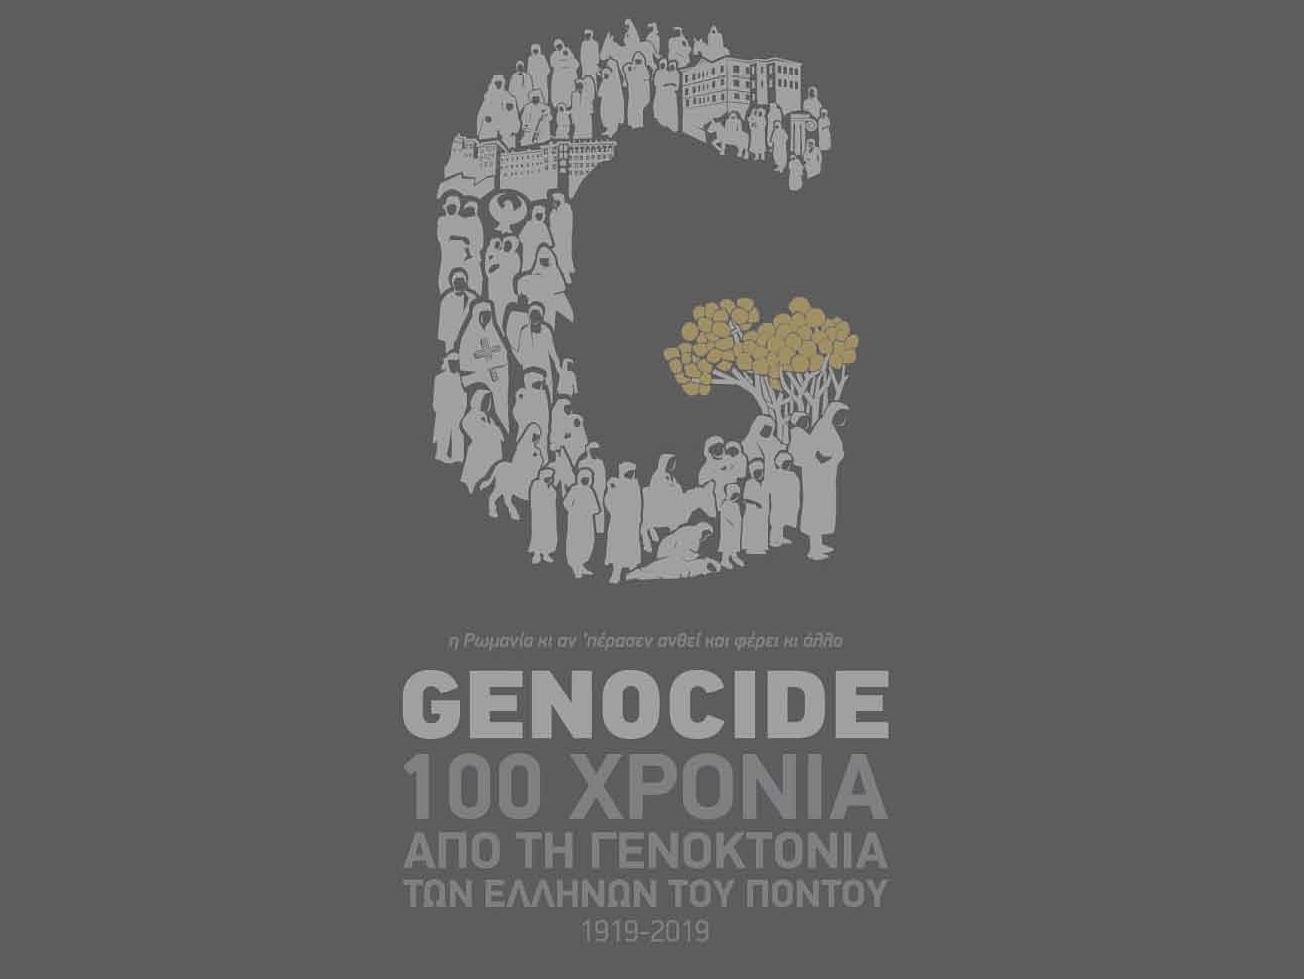 6ecc17660ce5 Στα πλαίσια των εκδηλώσεων για τα 100 χρόνια γενοκτονίας του Ποντιακού  Ελληνισμού οι Ποντιακοί Σύλλογοι Κιλκίς διοργανώνουν διάλεξη στις 21  Μαρτίου 2019 και ...